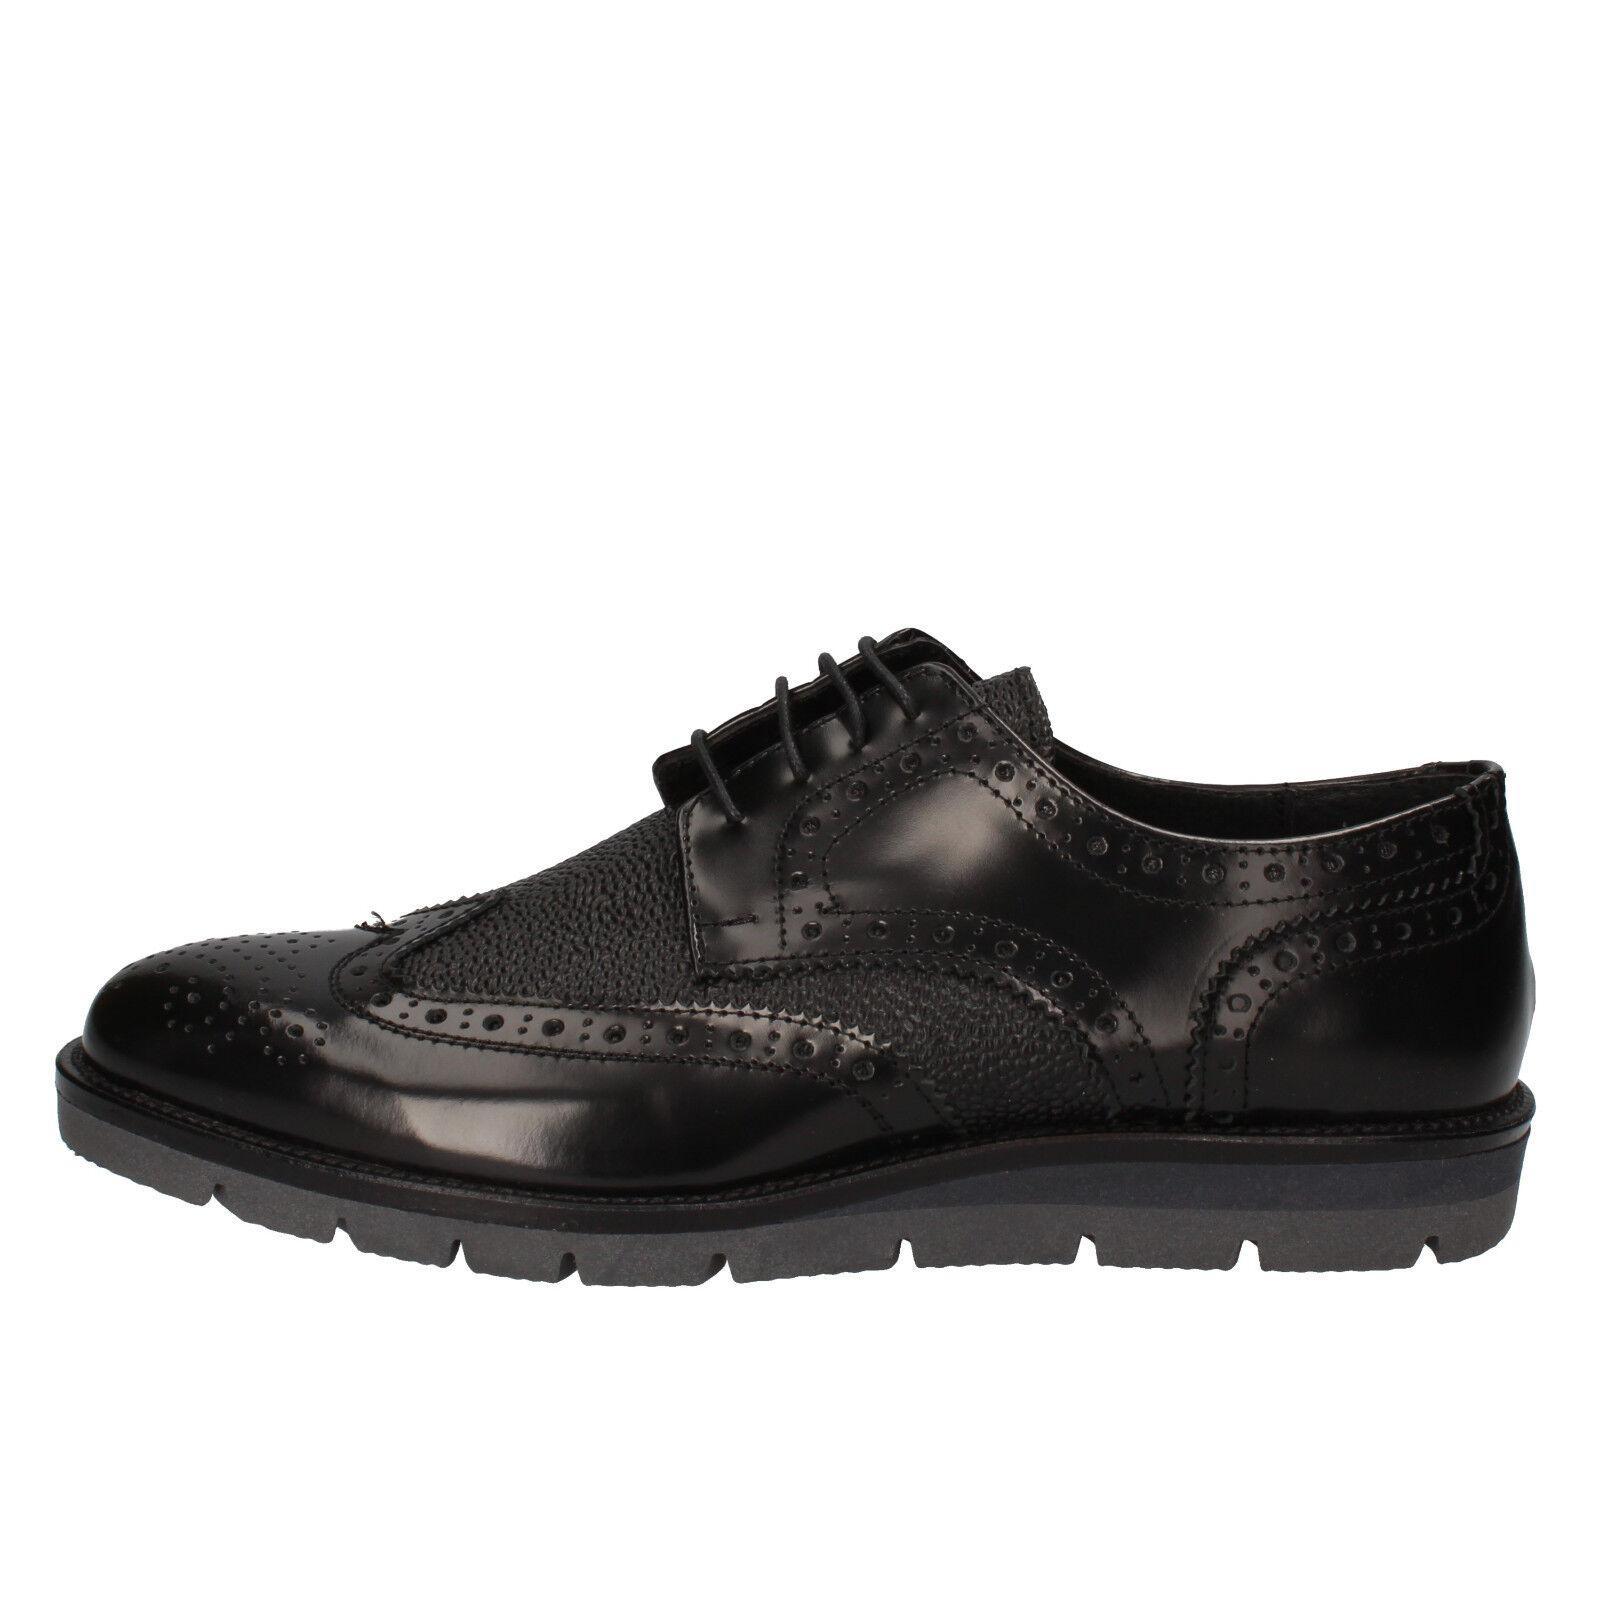 men's shoes J BREITLIN 9 () elegant black shiny leather AD15-D